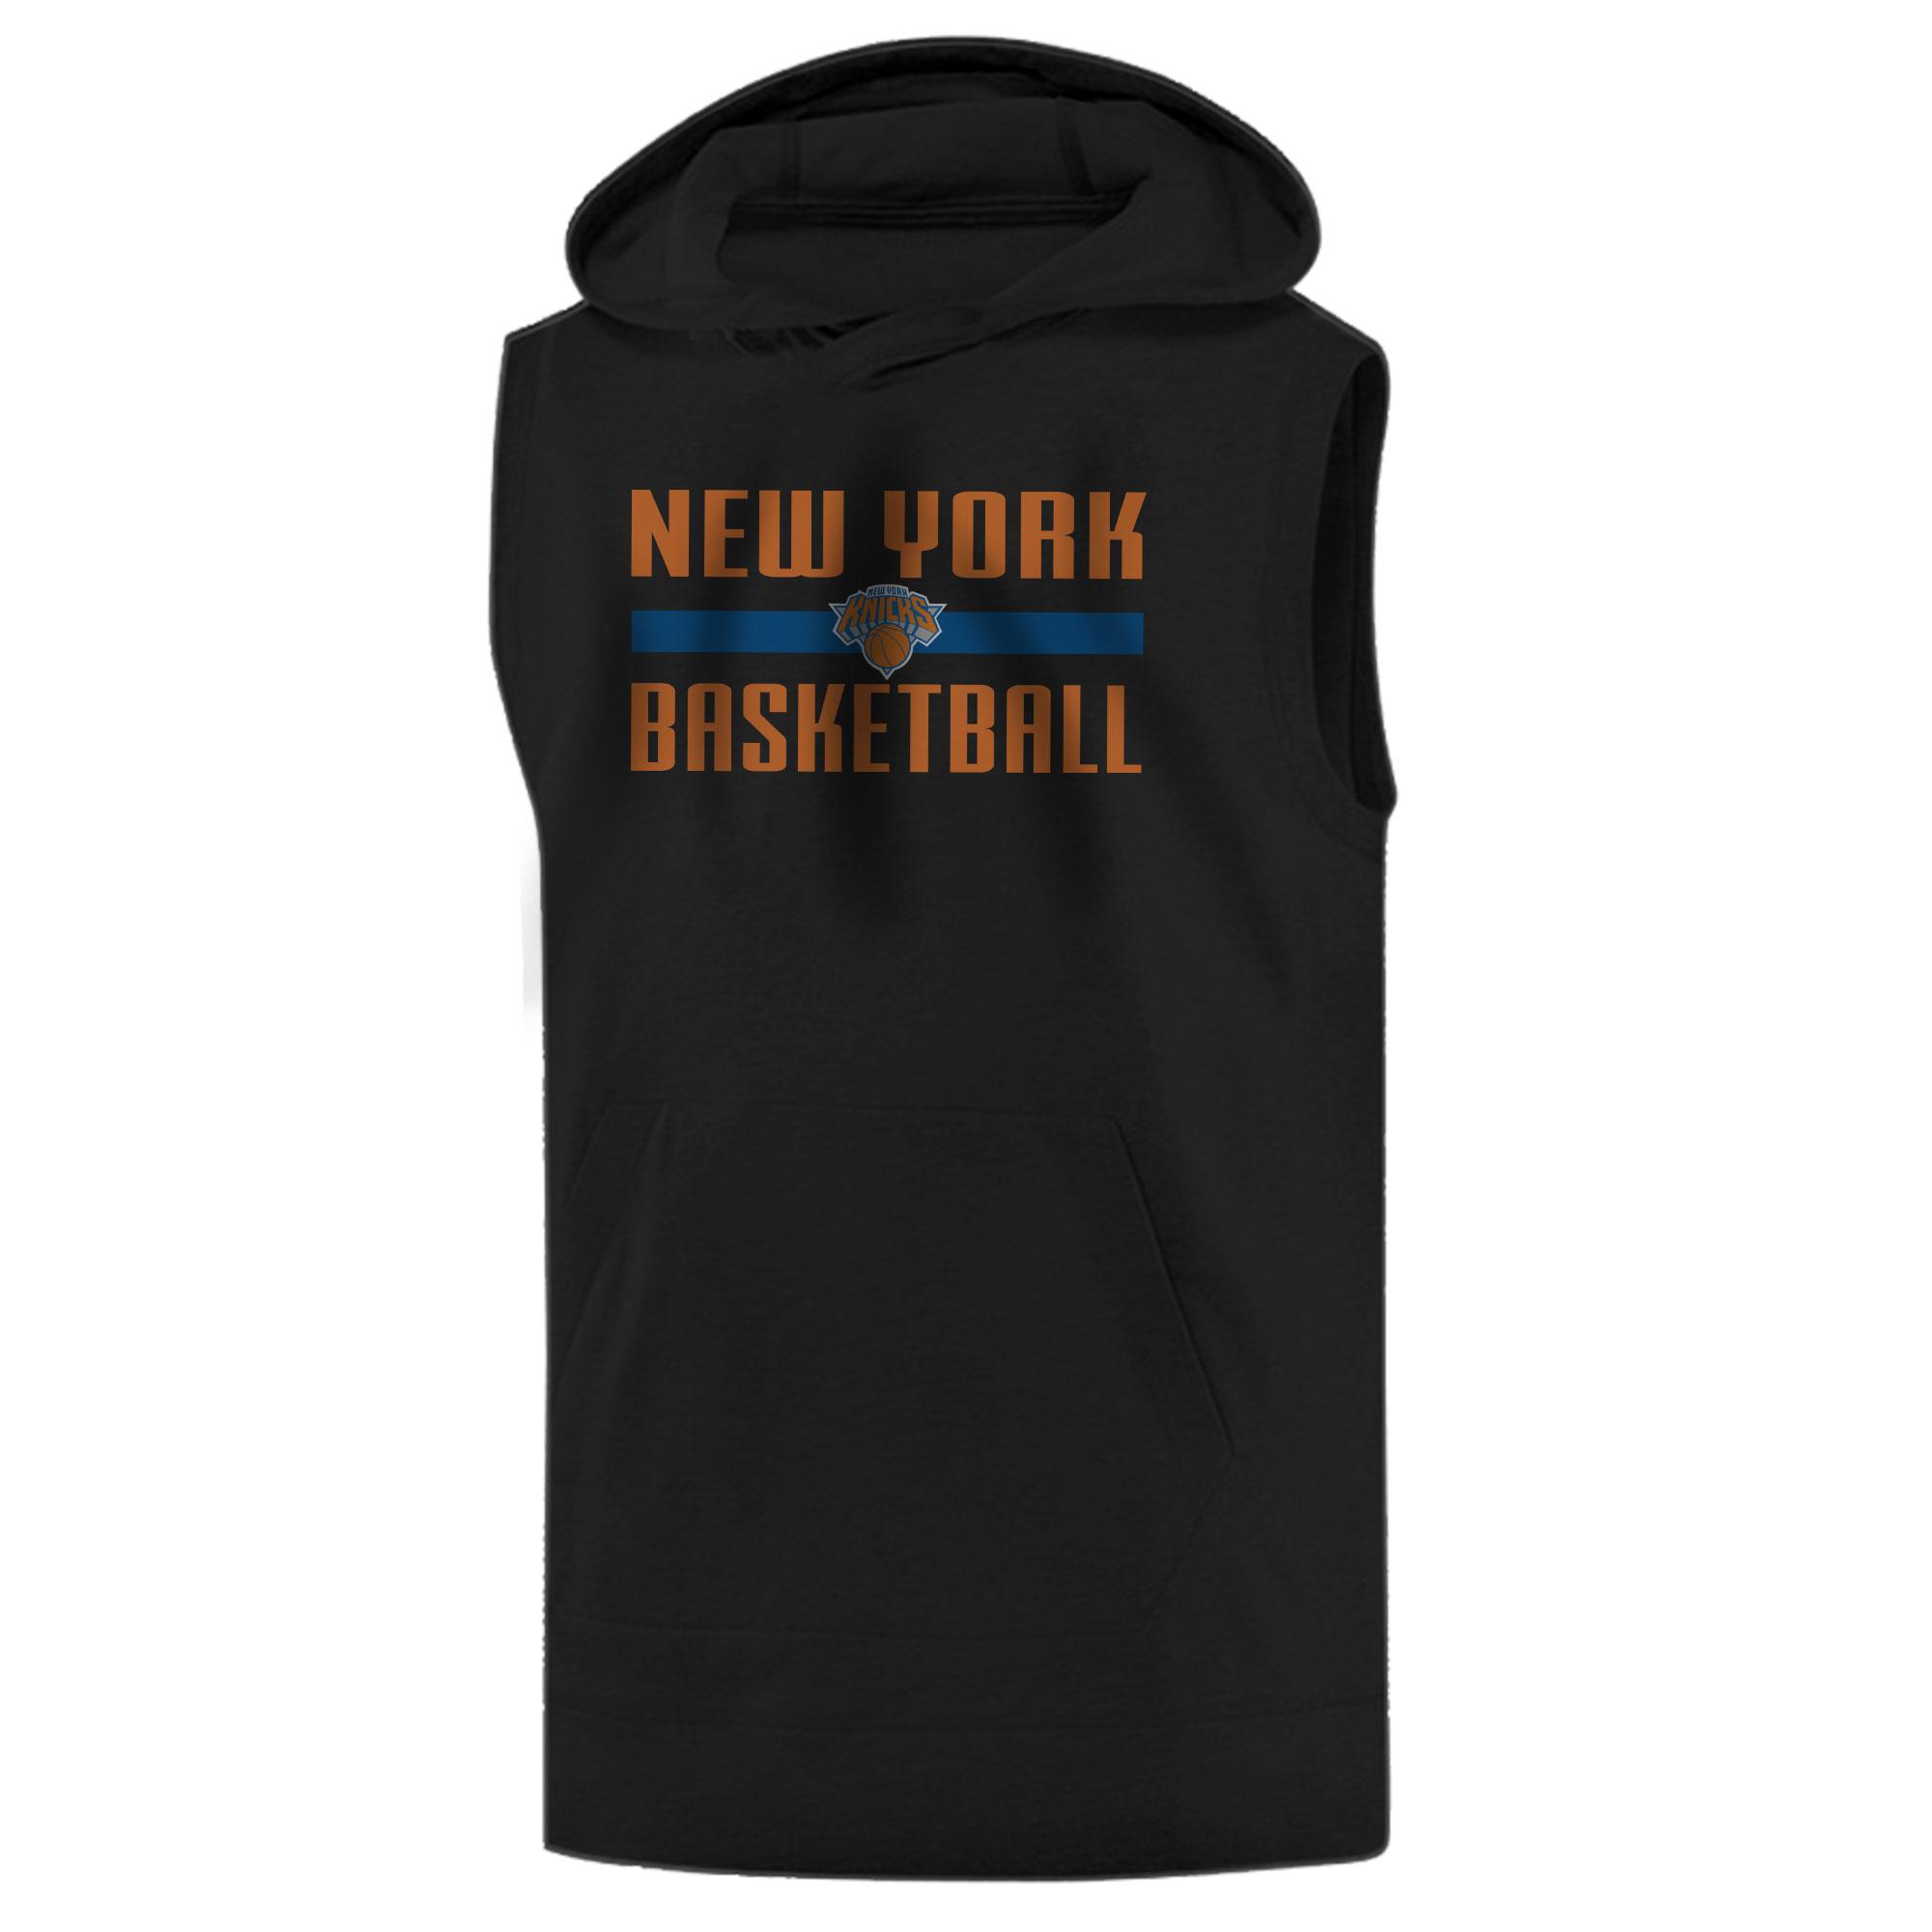 New York Knicks Basketball Sleeveless (KLS-BLC-NP-knicks-bsktbll-531)